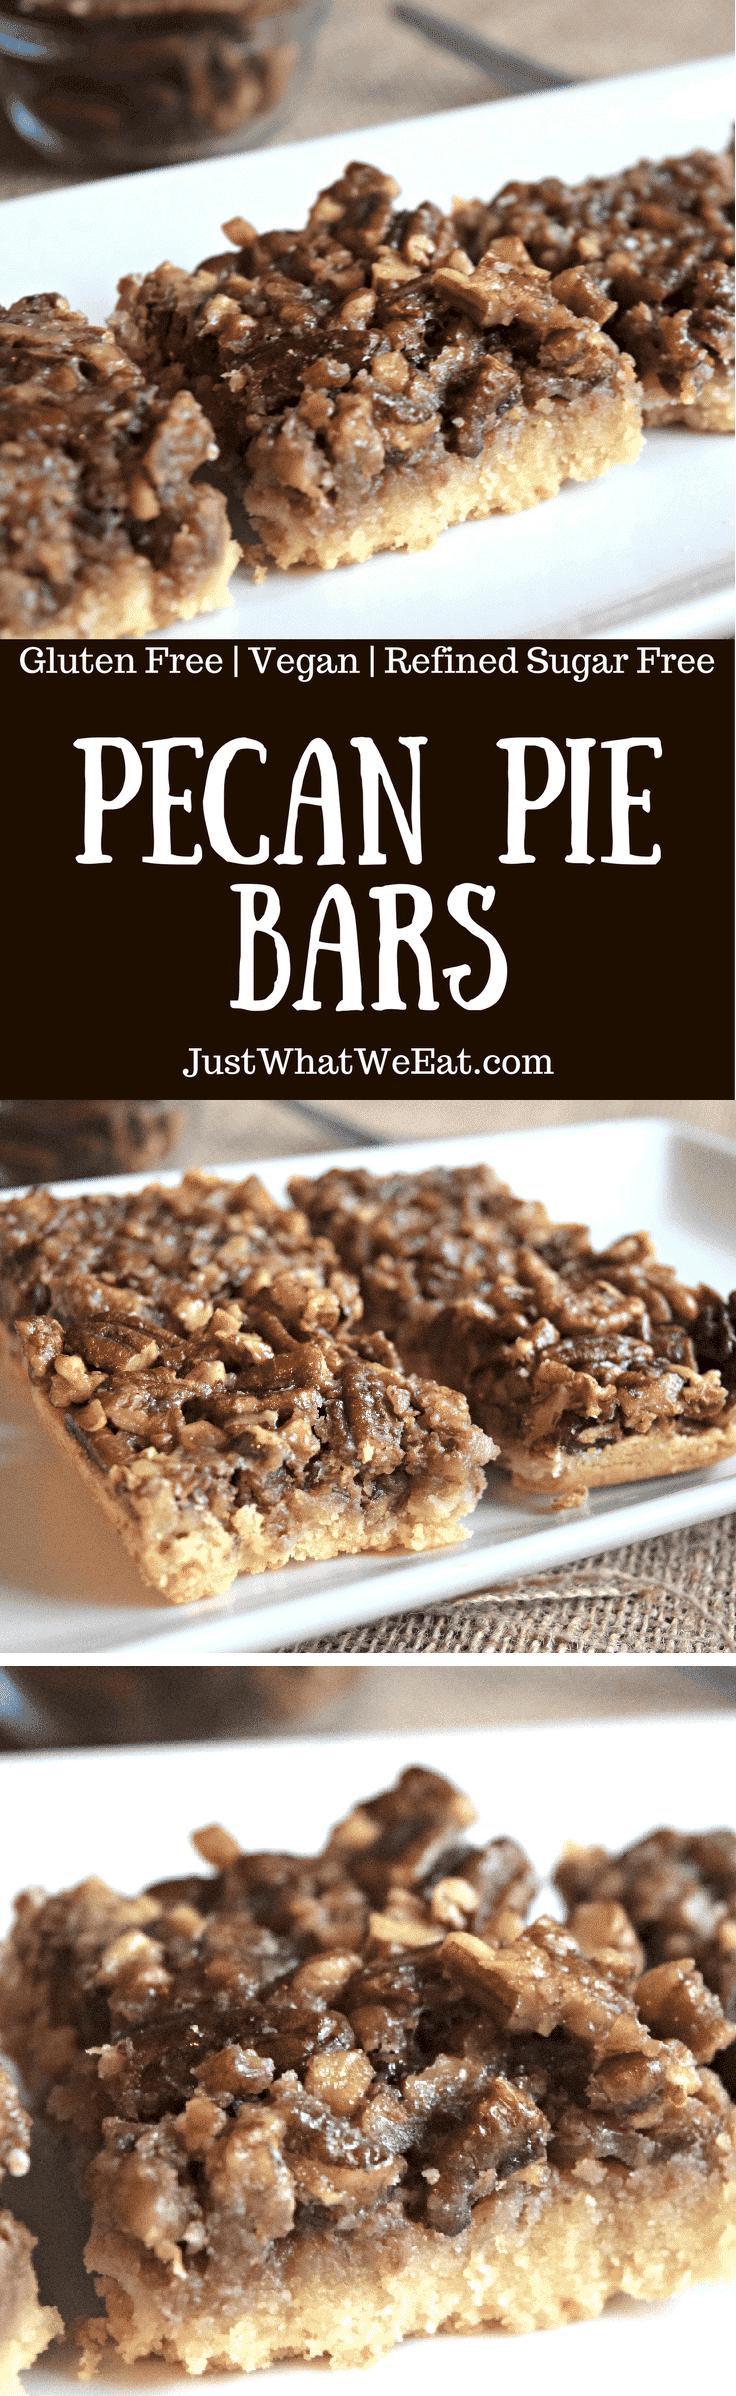 Pecan Pie Bars - Gluten Free, Vegan, & Refined Sugar Free